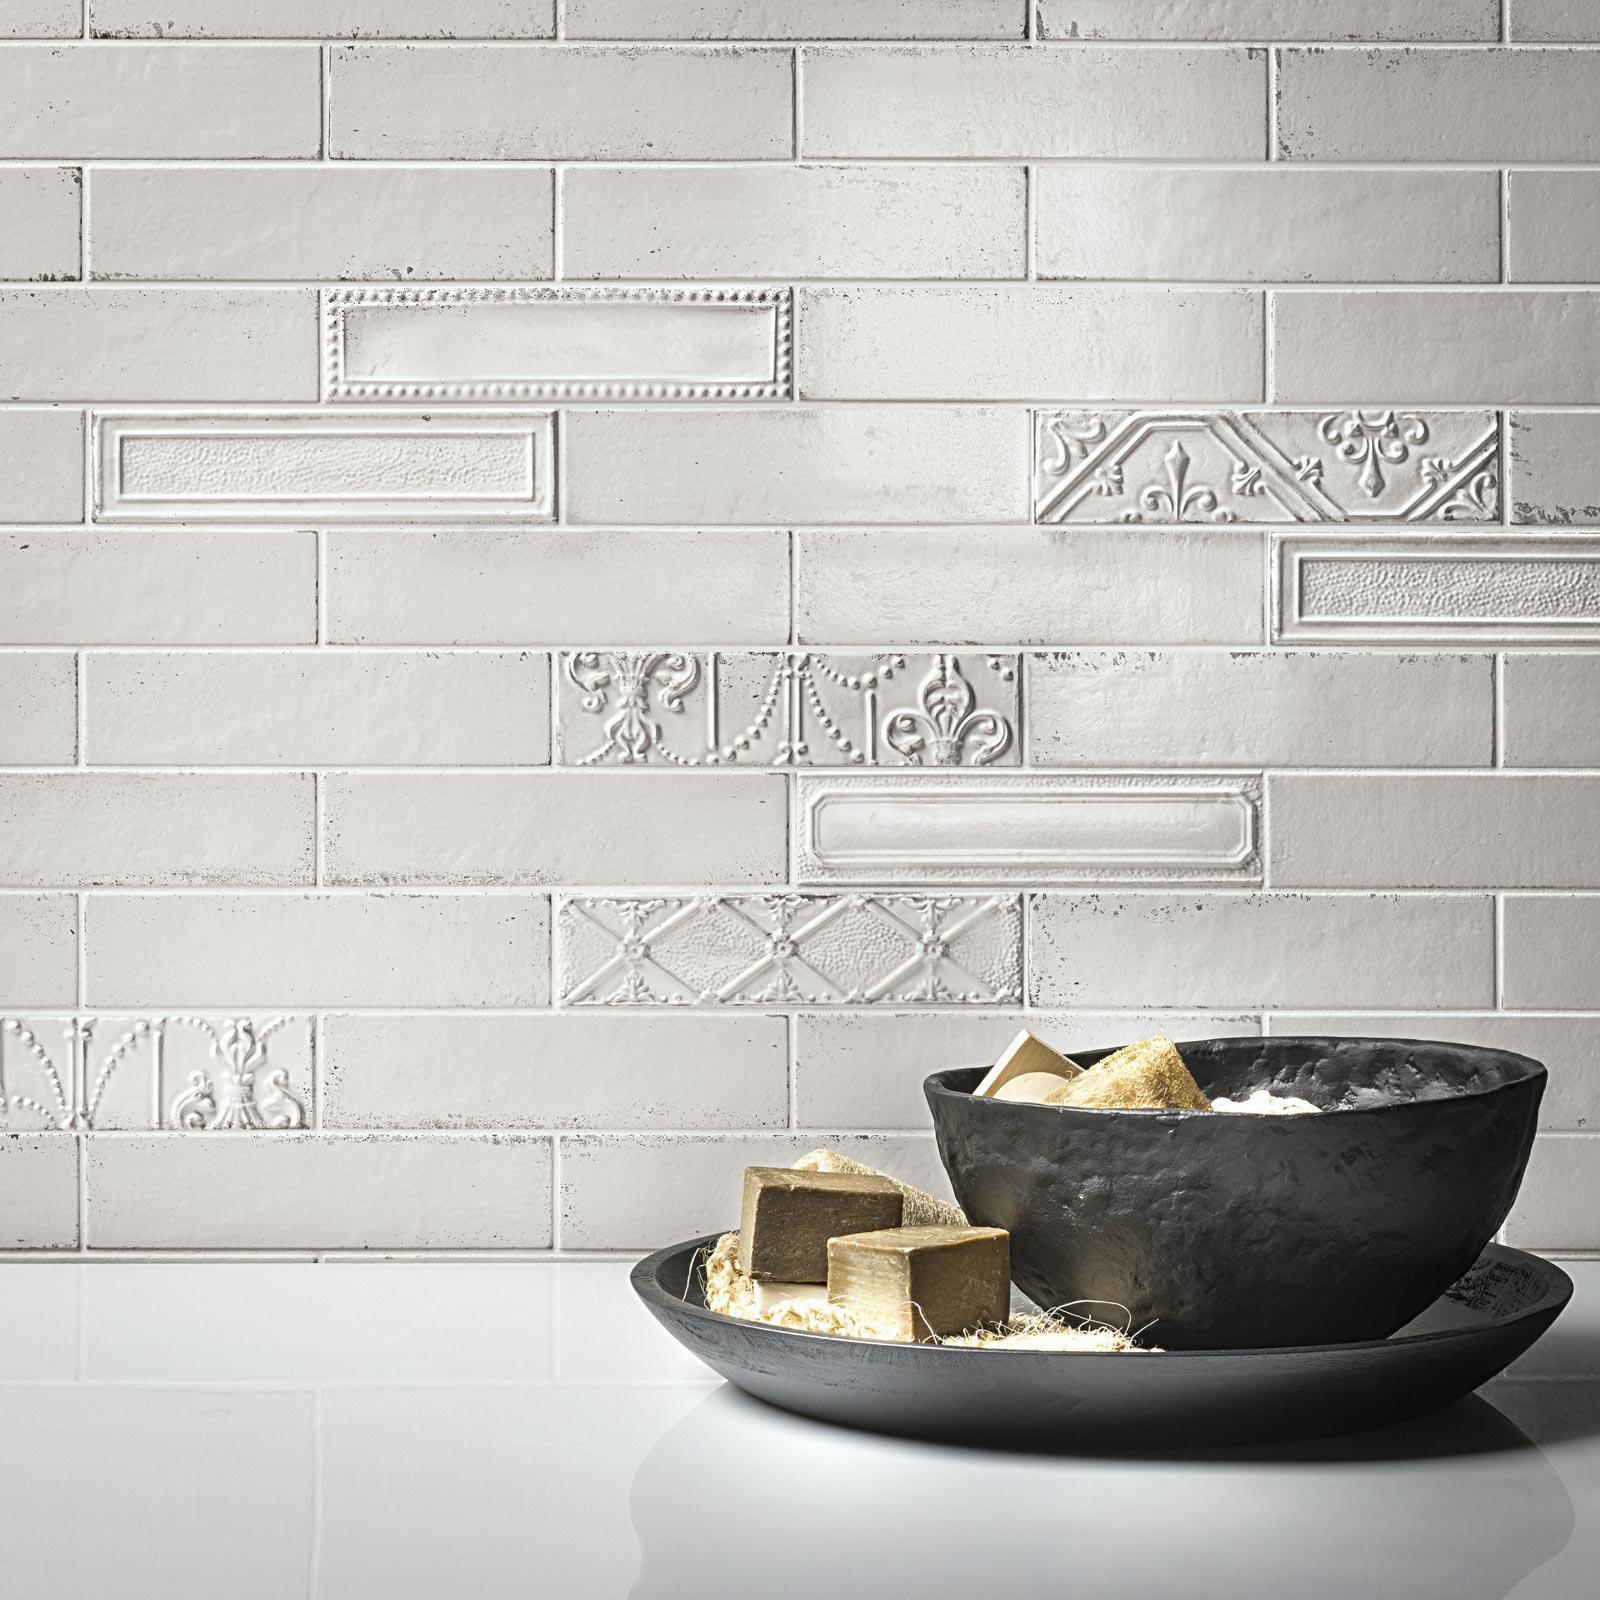 Famous 12X12 Acoustic Ceiling Tiles Thick 12X12 Vinyl Floor Tile Shaped 12X24 Ceramic Floor Tile 2 By 2 Ceiling Tiles Youthful 2X4 Ceiling Tiles Cheap Soft2X4 Subway Tile Backsplash Eden Collection: Majolica Effect Tiles | Ragno